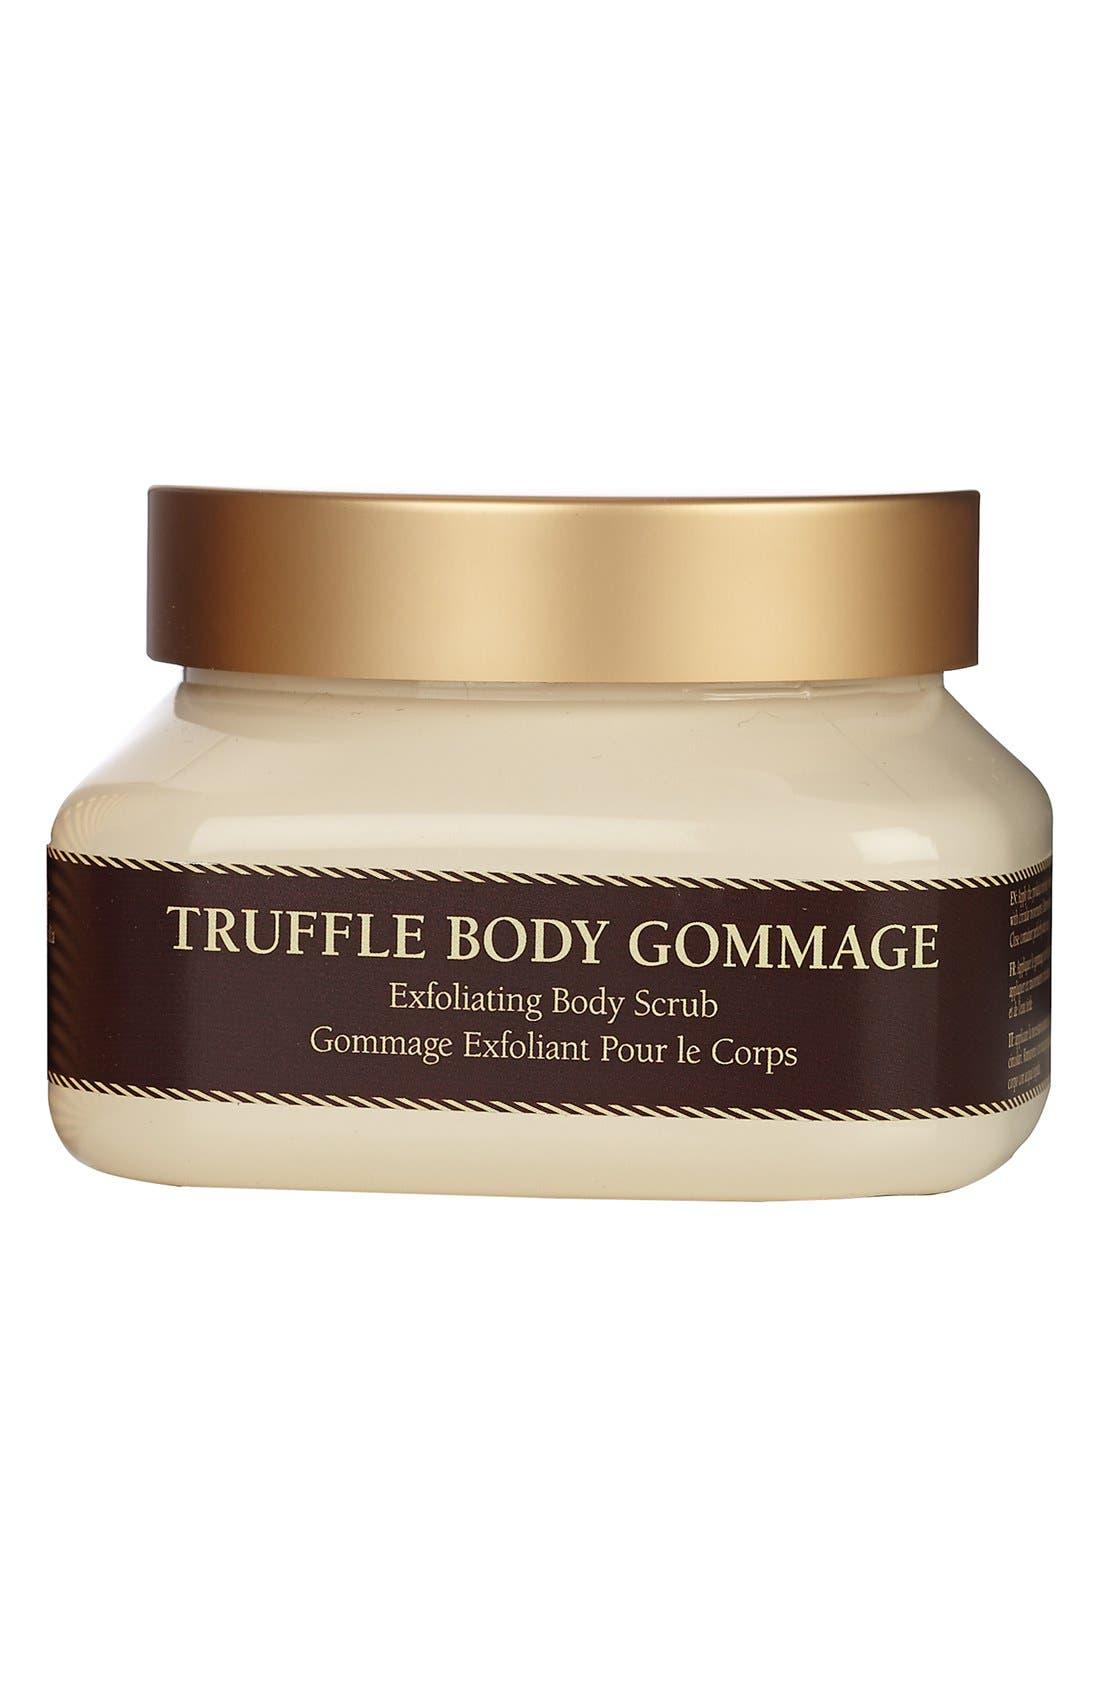 SKIN&CO Truffle Body Gommage